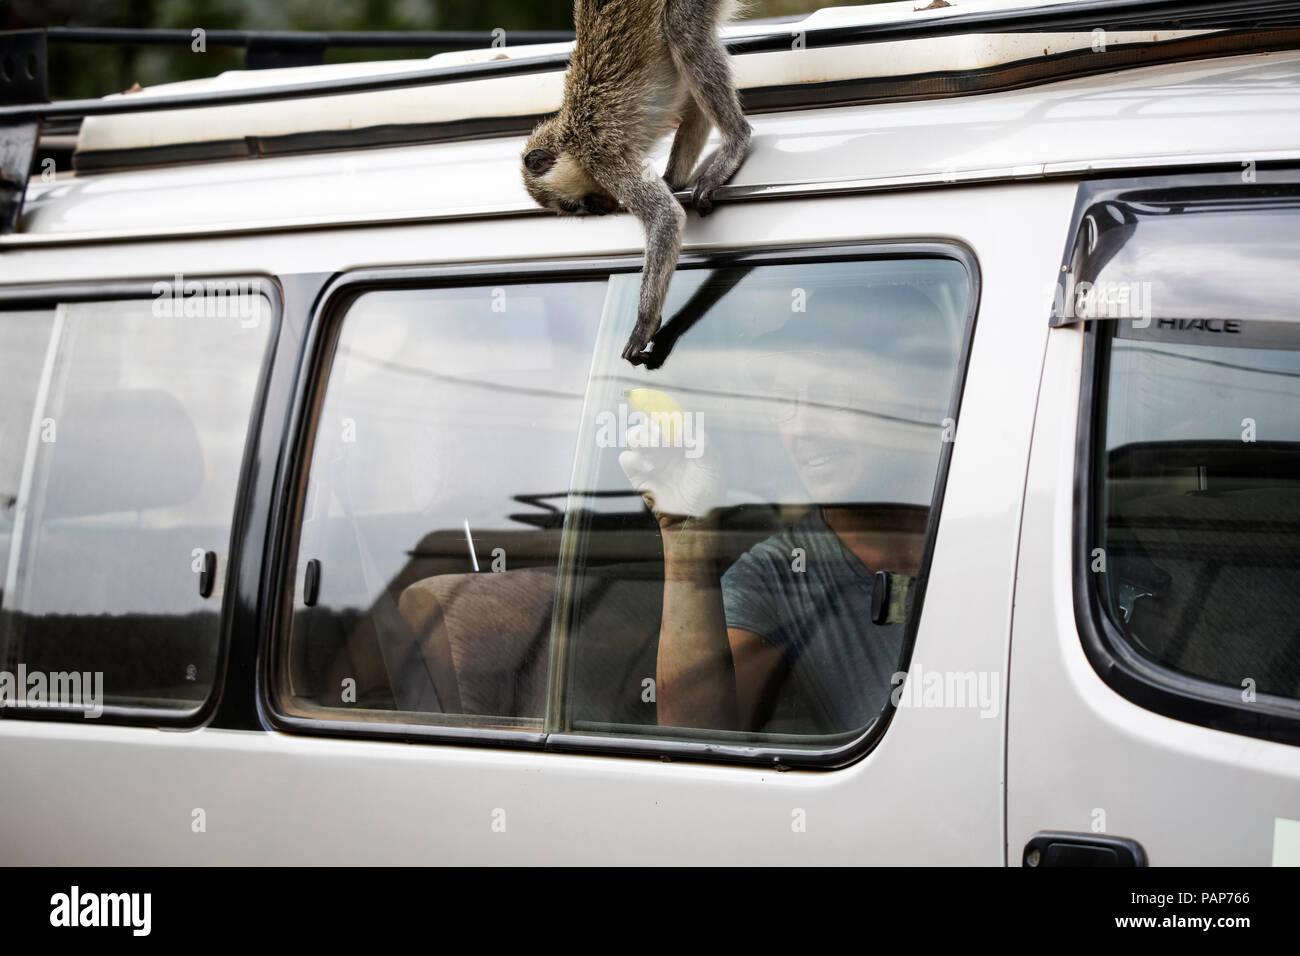 Uganda, Queen Elisabeth National Park, Curious vervet monkey climing on off-road vehicle - Stock Image